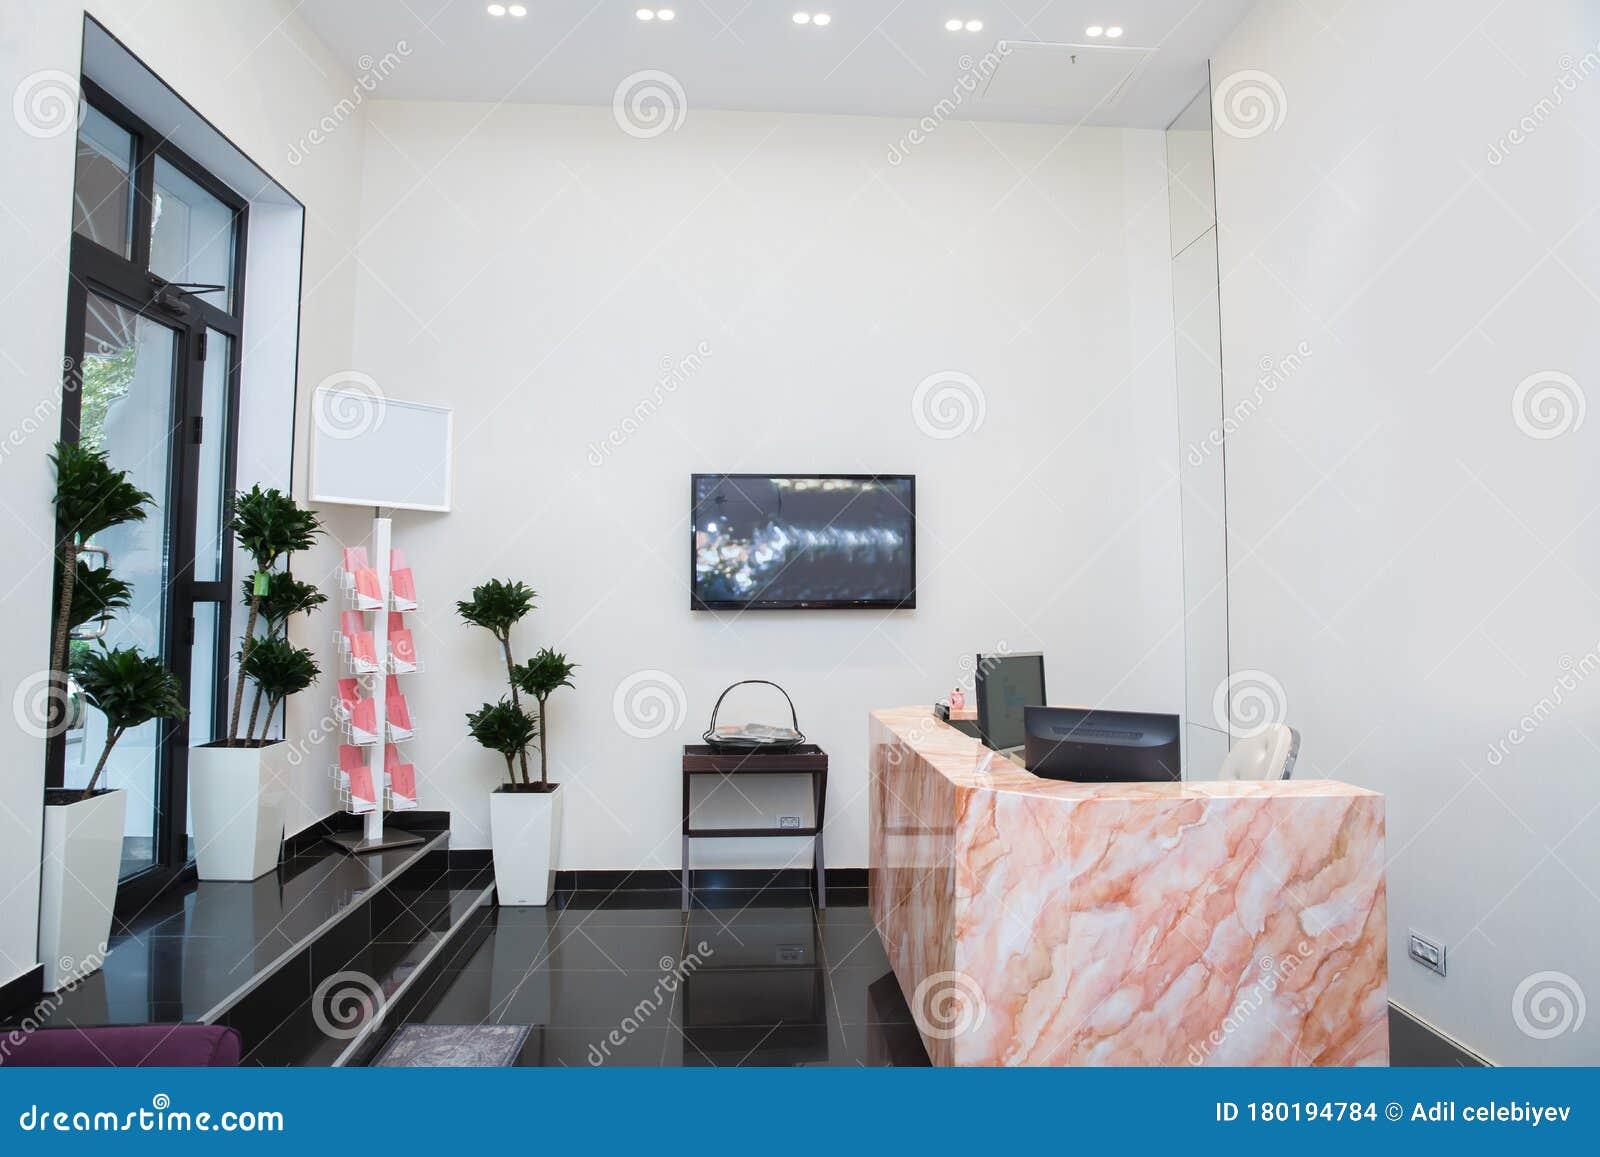 Interior Design Reception Of A Bright Beauty Salon Reception Area At The Beauty Salon Red Marble Reception Glass Door Editorial Stock Image Image Of Indoor Banner 180194784